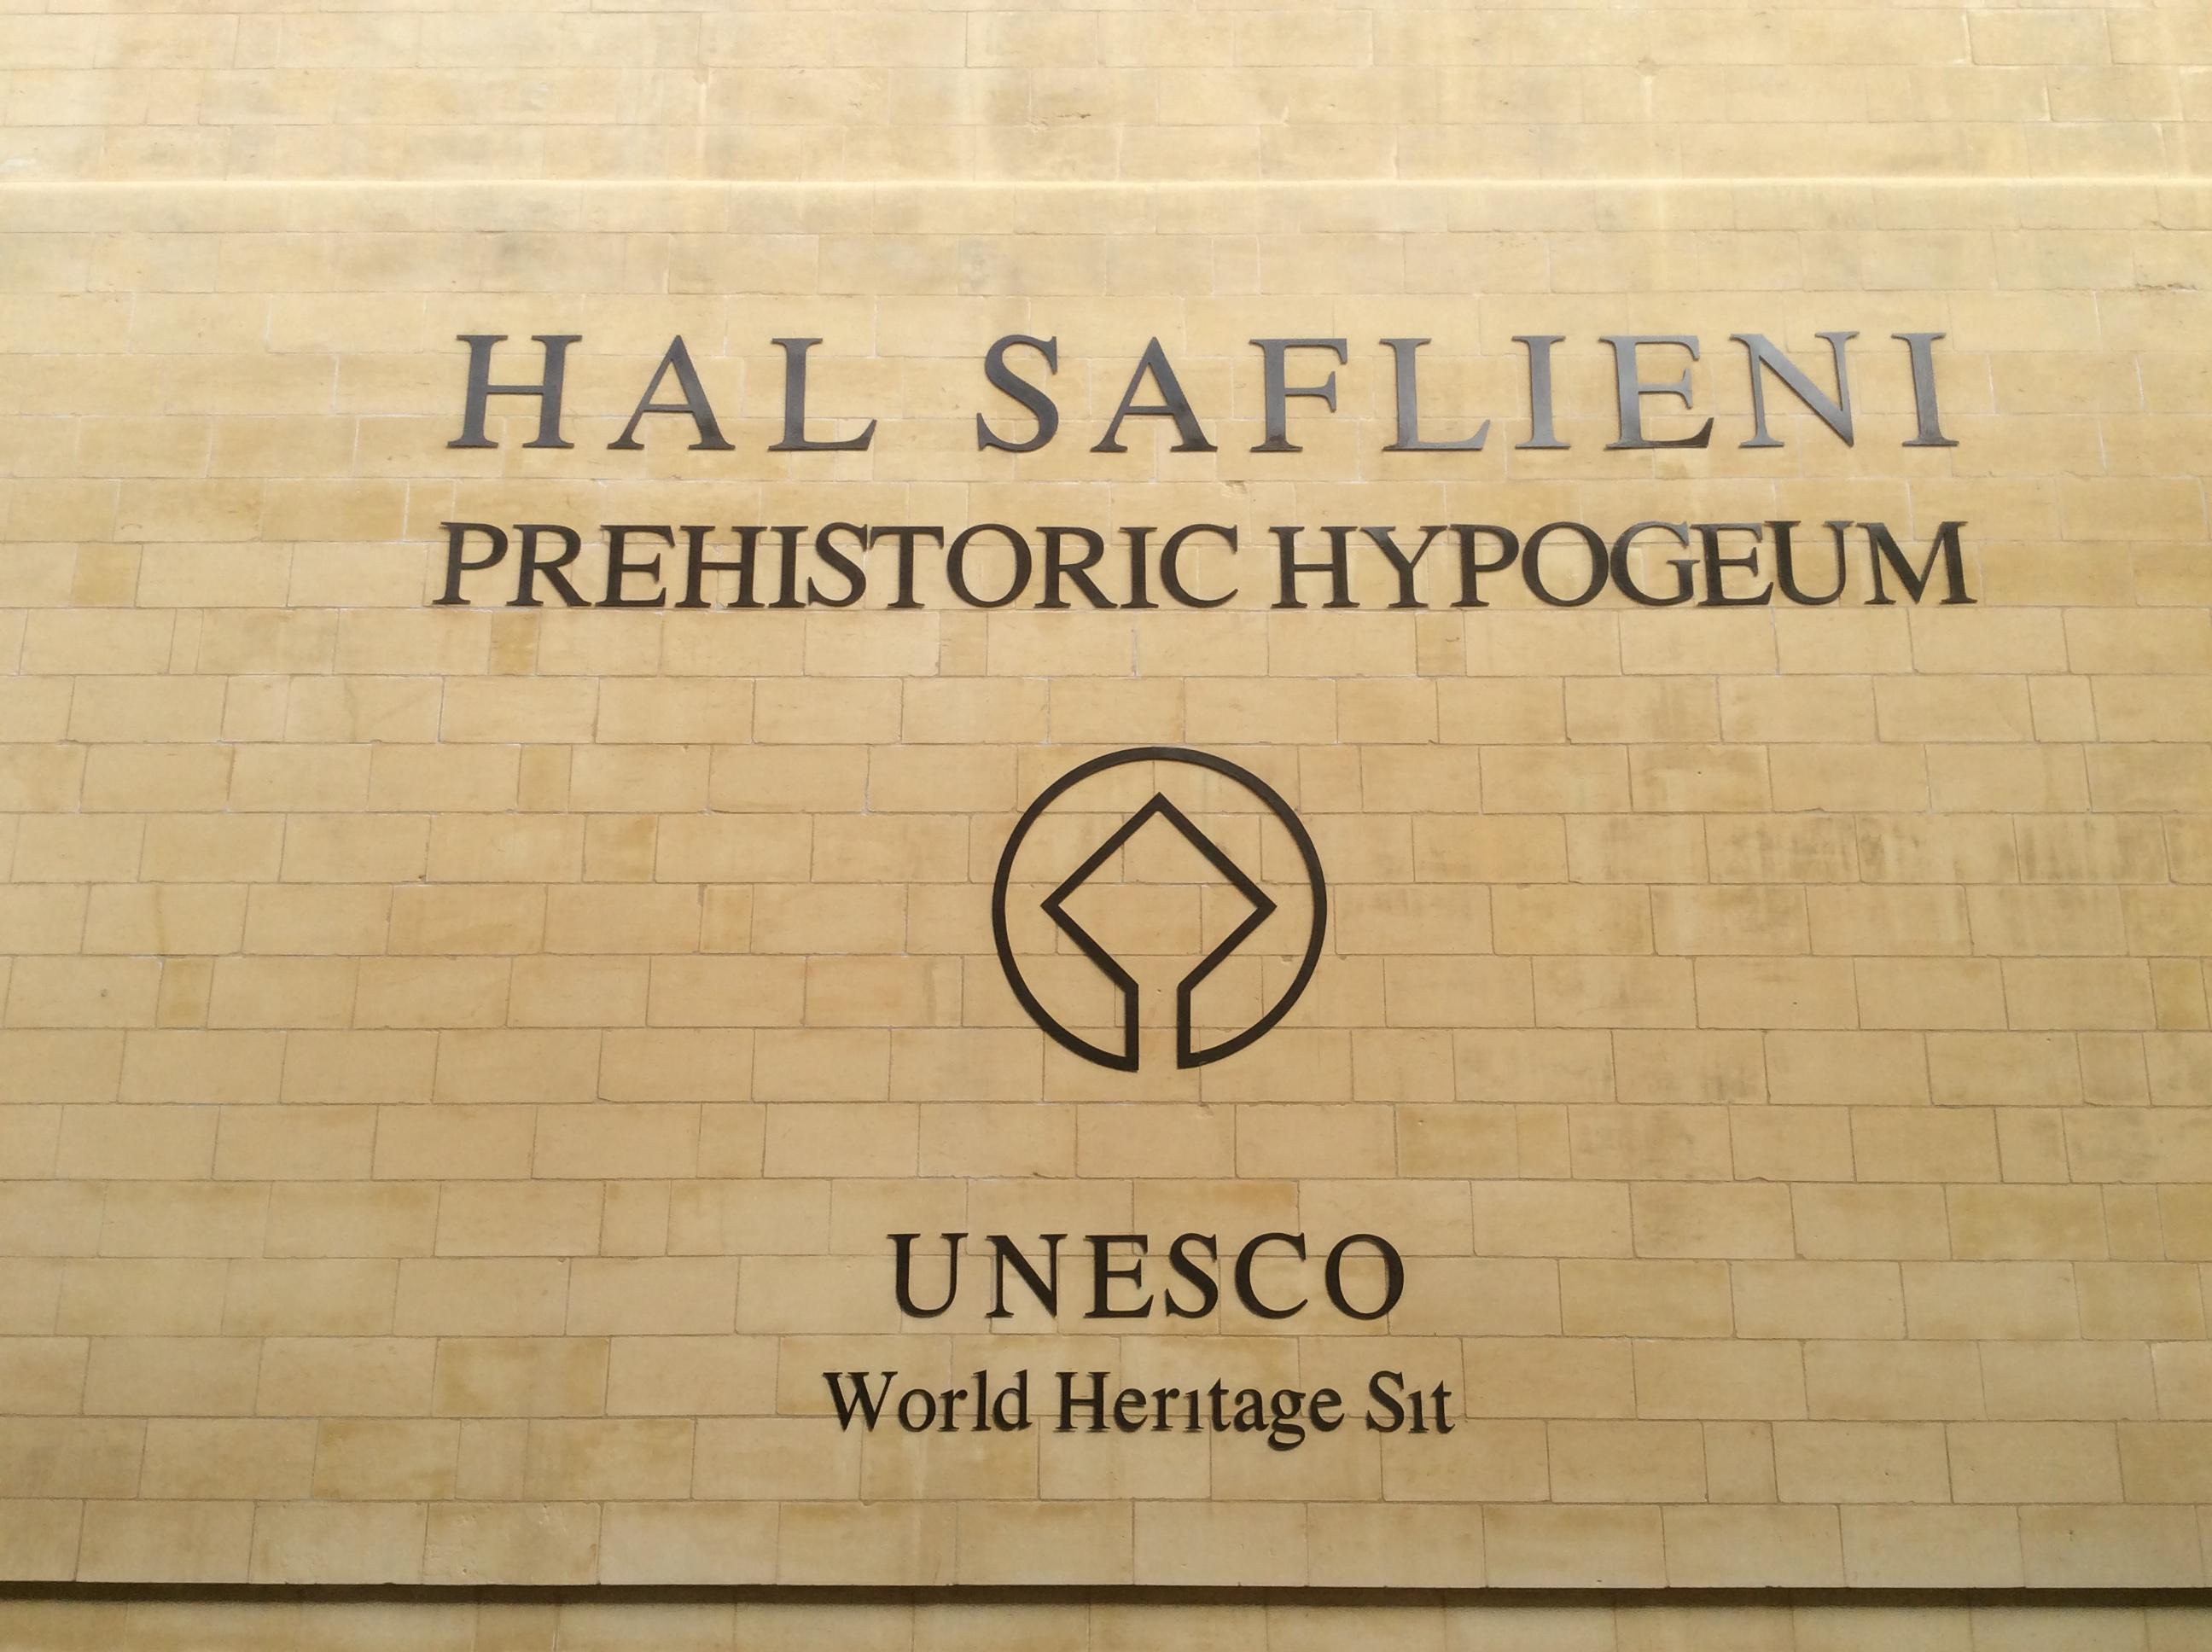 Ħal-Saflieni Museum façade after restoration. Photo taken on March 25, 2017.